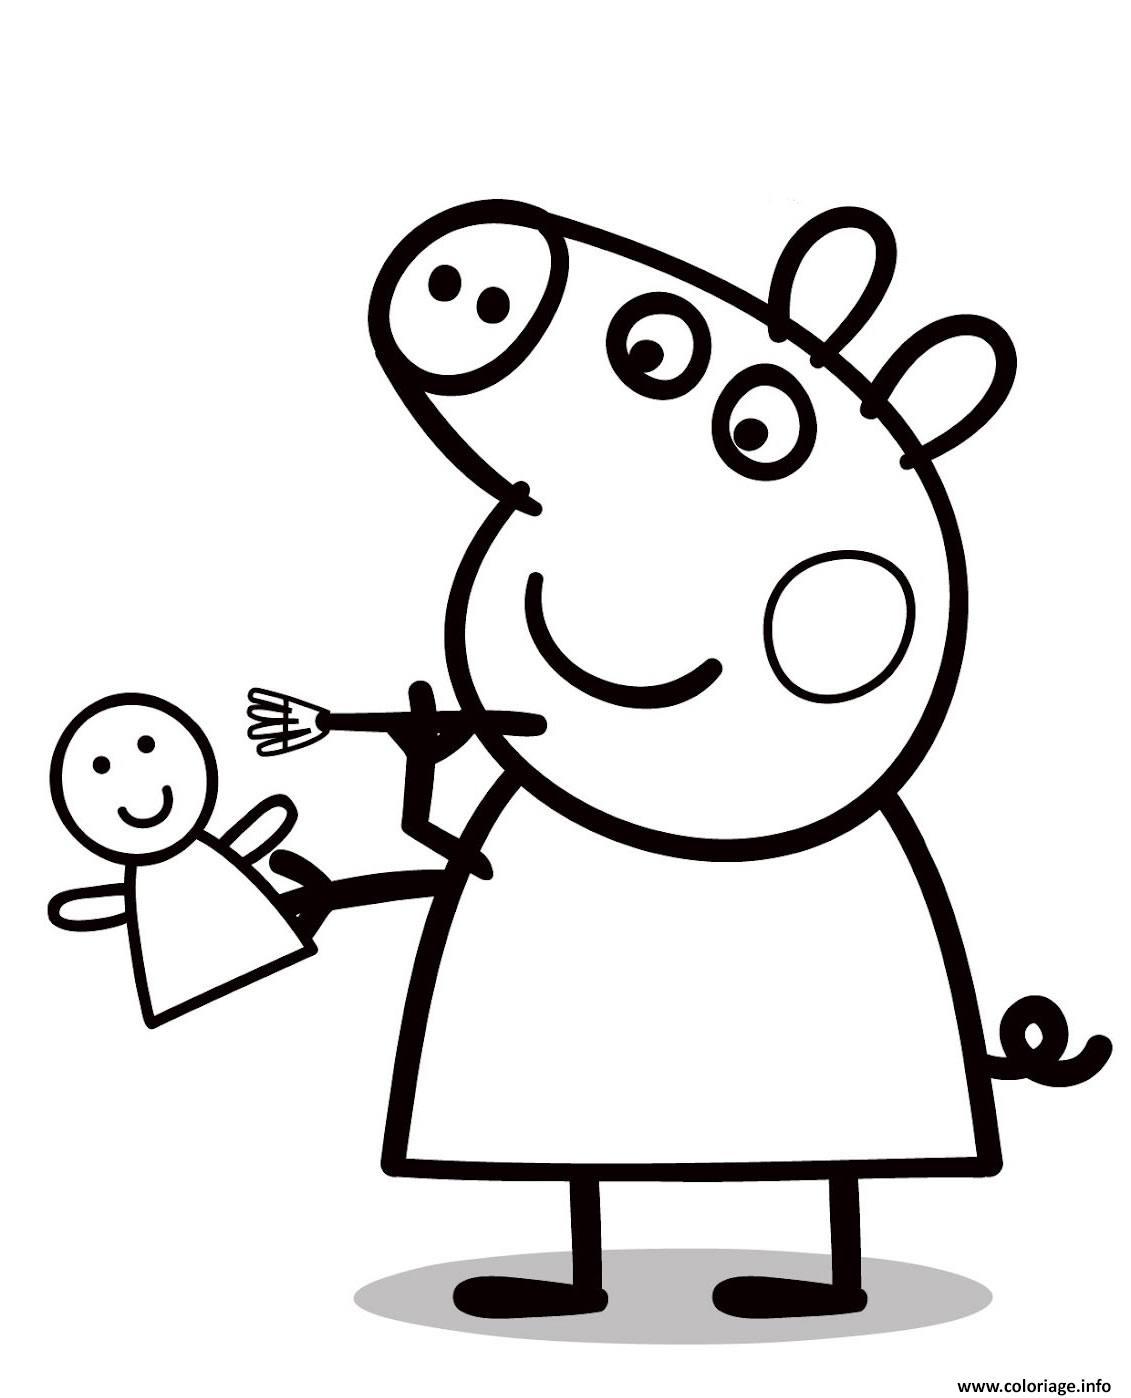 Coloriage peppa pig 69 dessin - Dessin a imprimer peppa pig ...